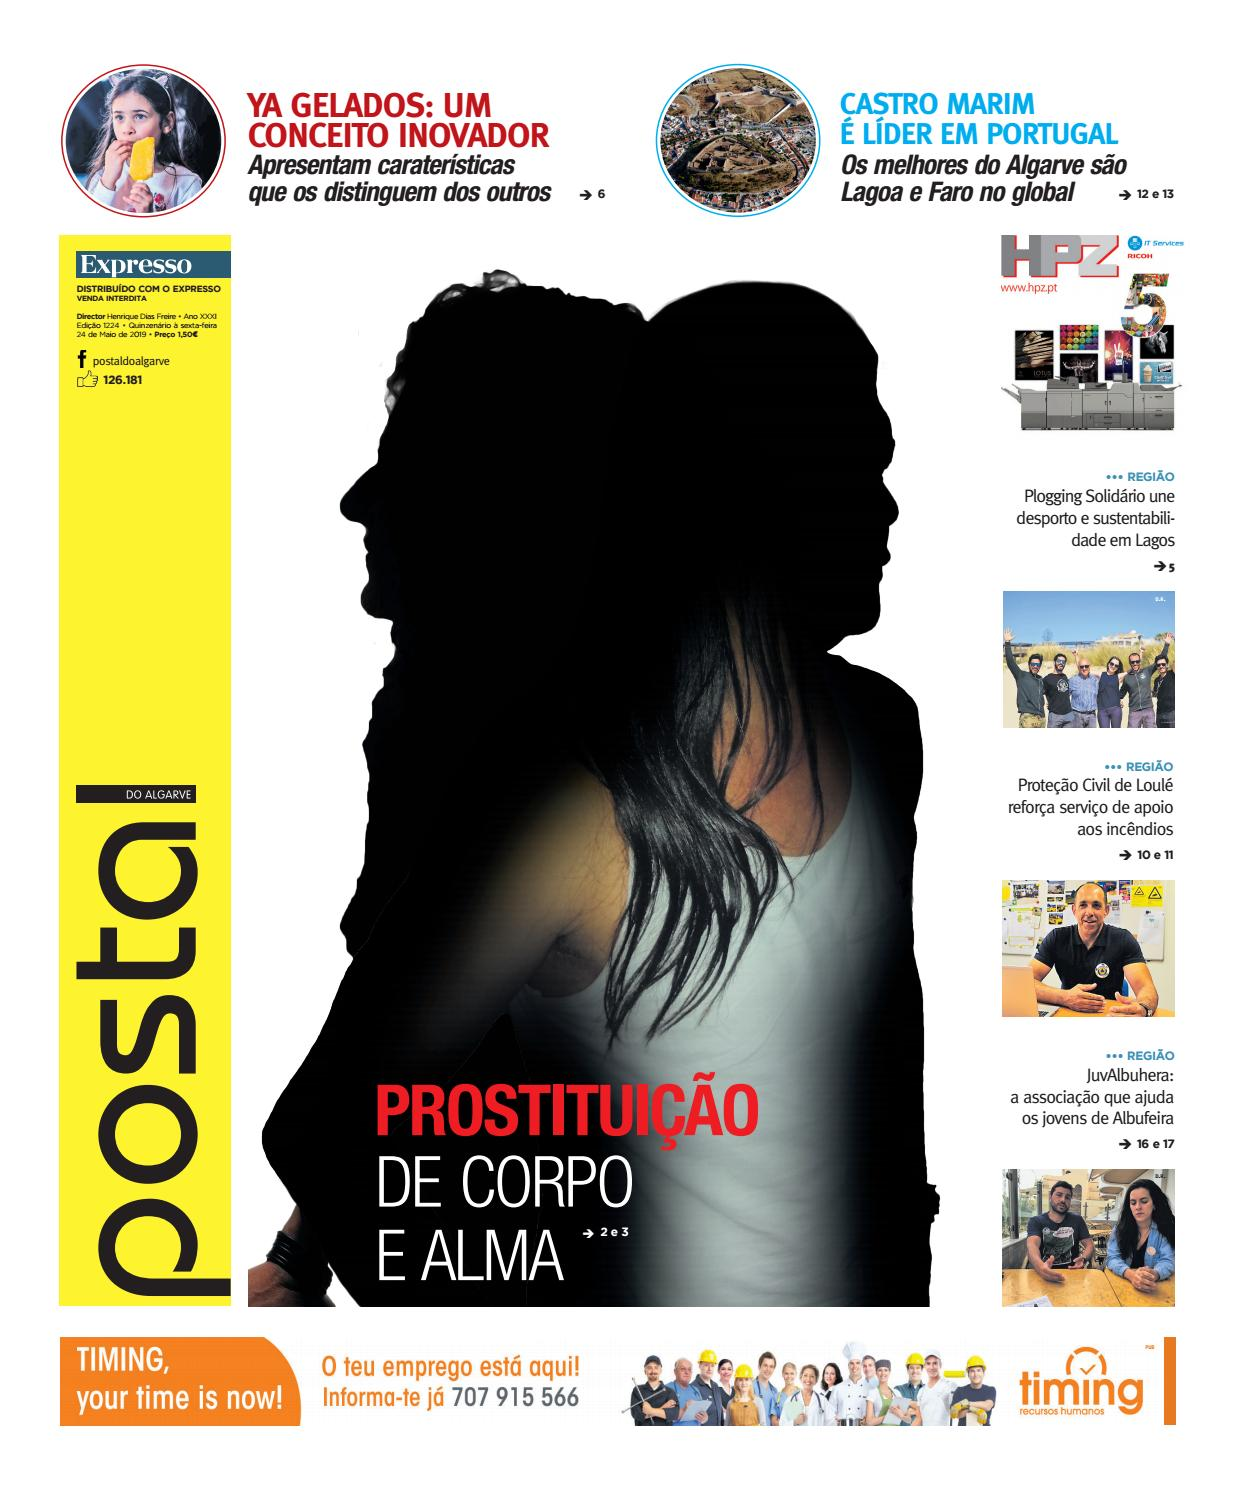 4d635e439 POSTAL 1224 24MAI2019 by POSTAL do ALGARVE - issuu